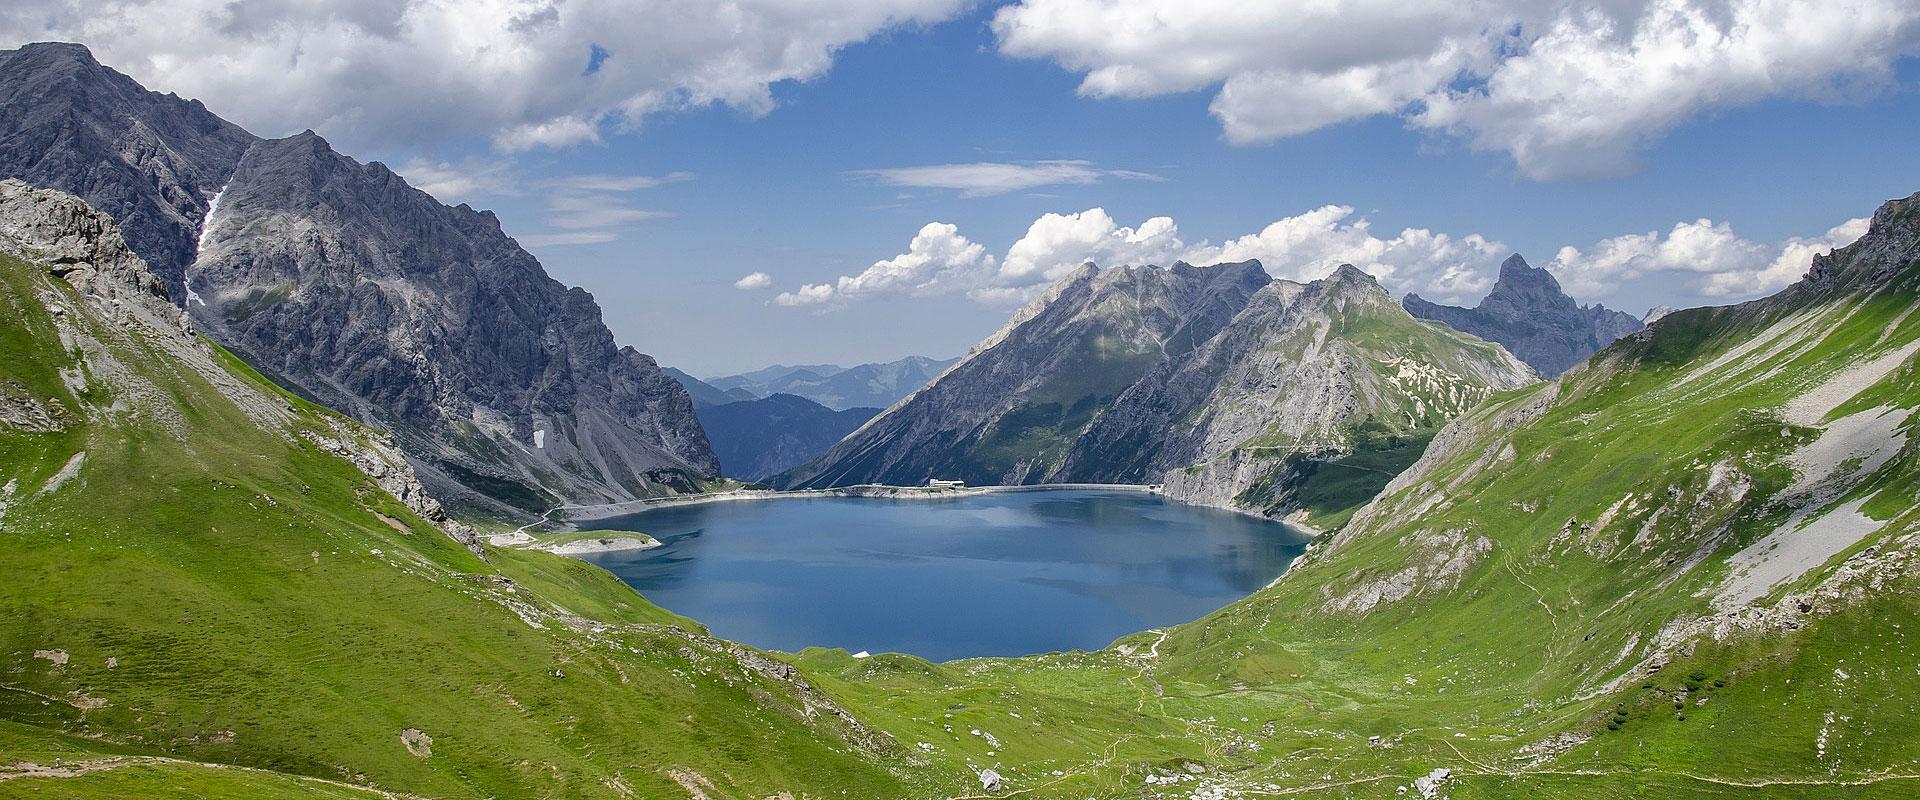 Vorarlberg - Lünersee im Montafon